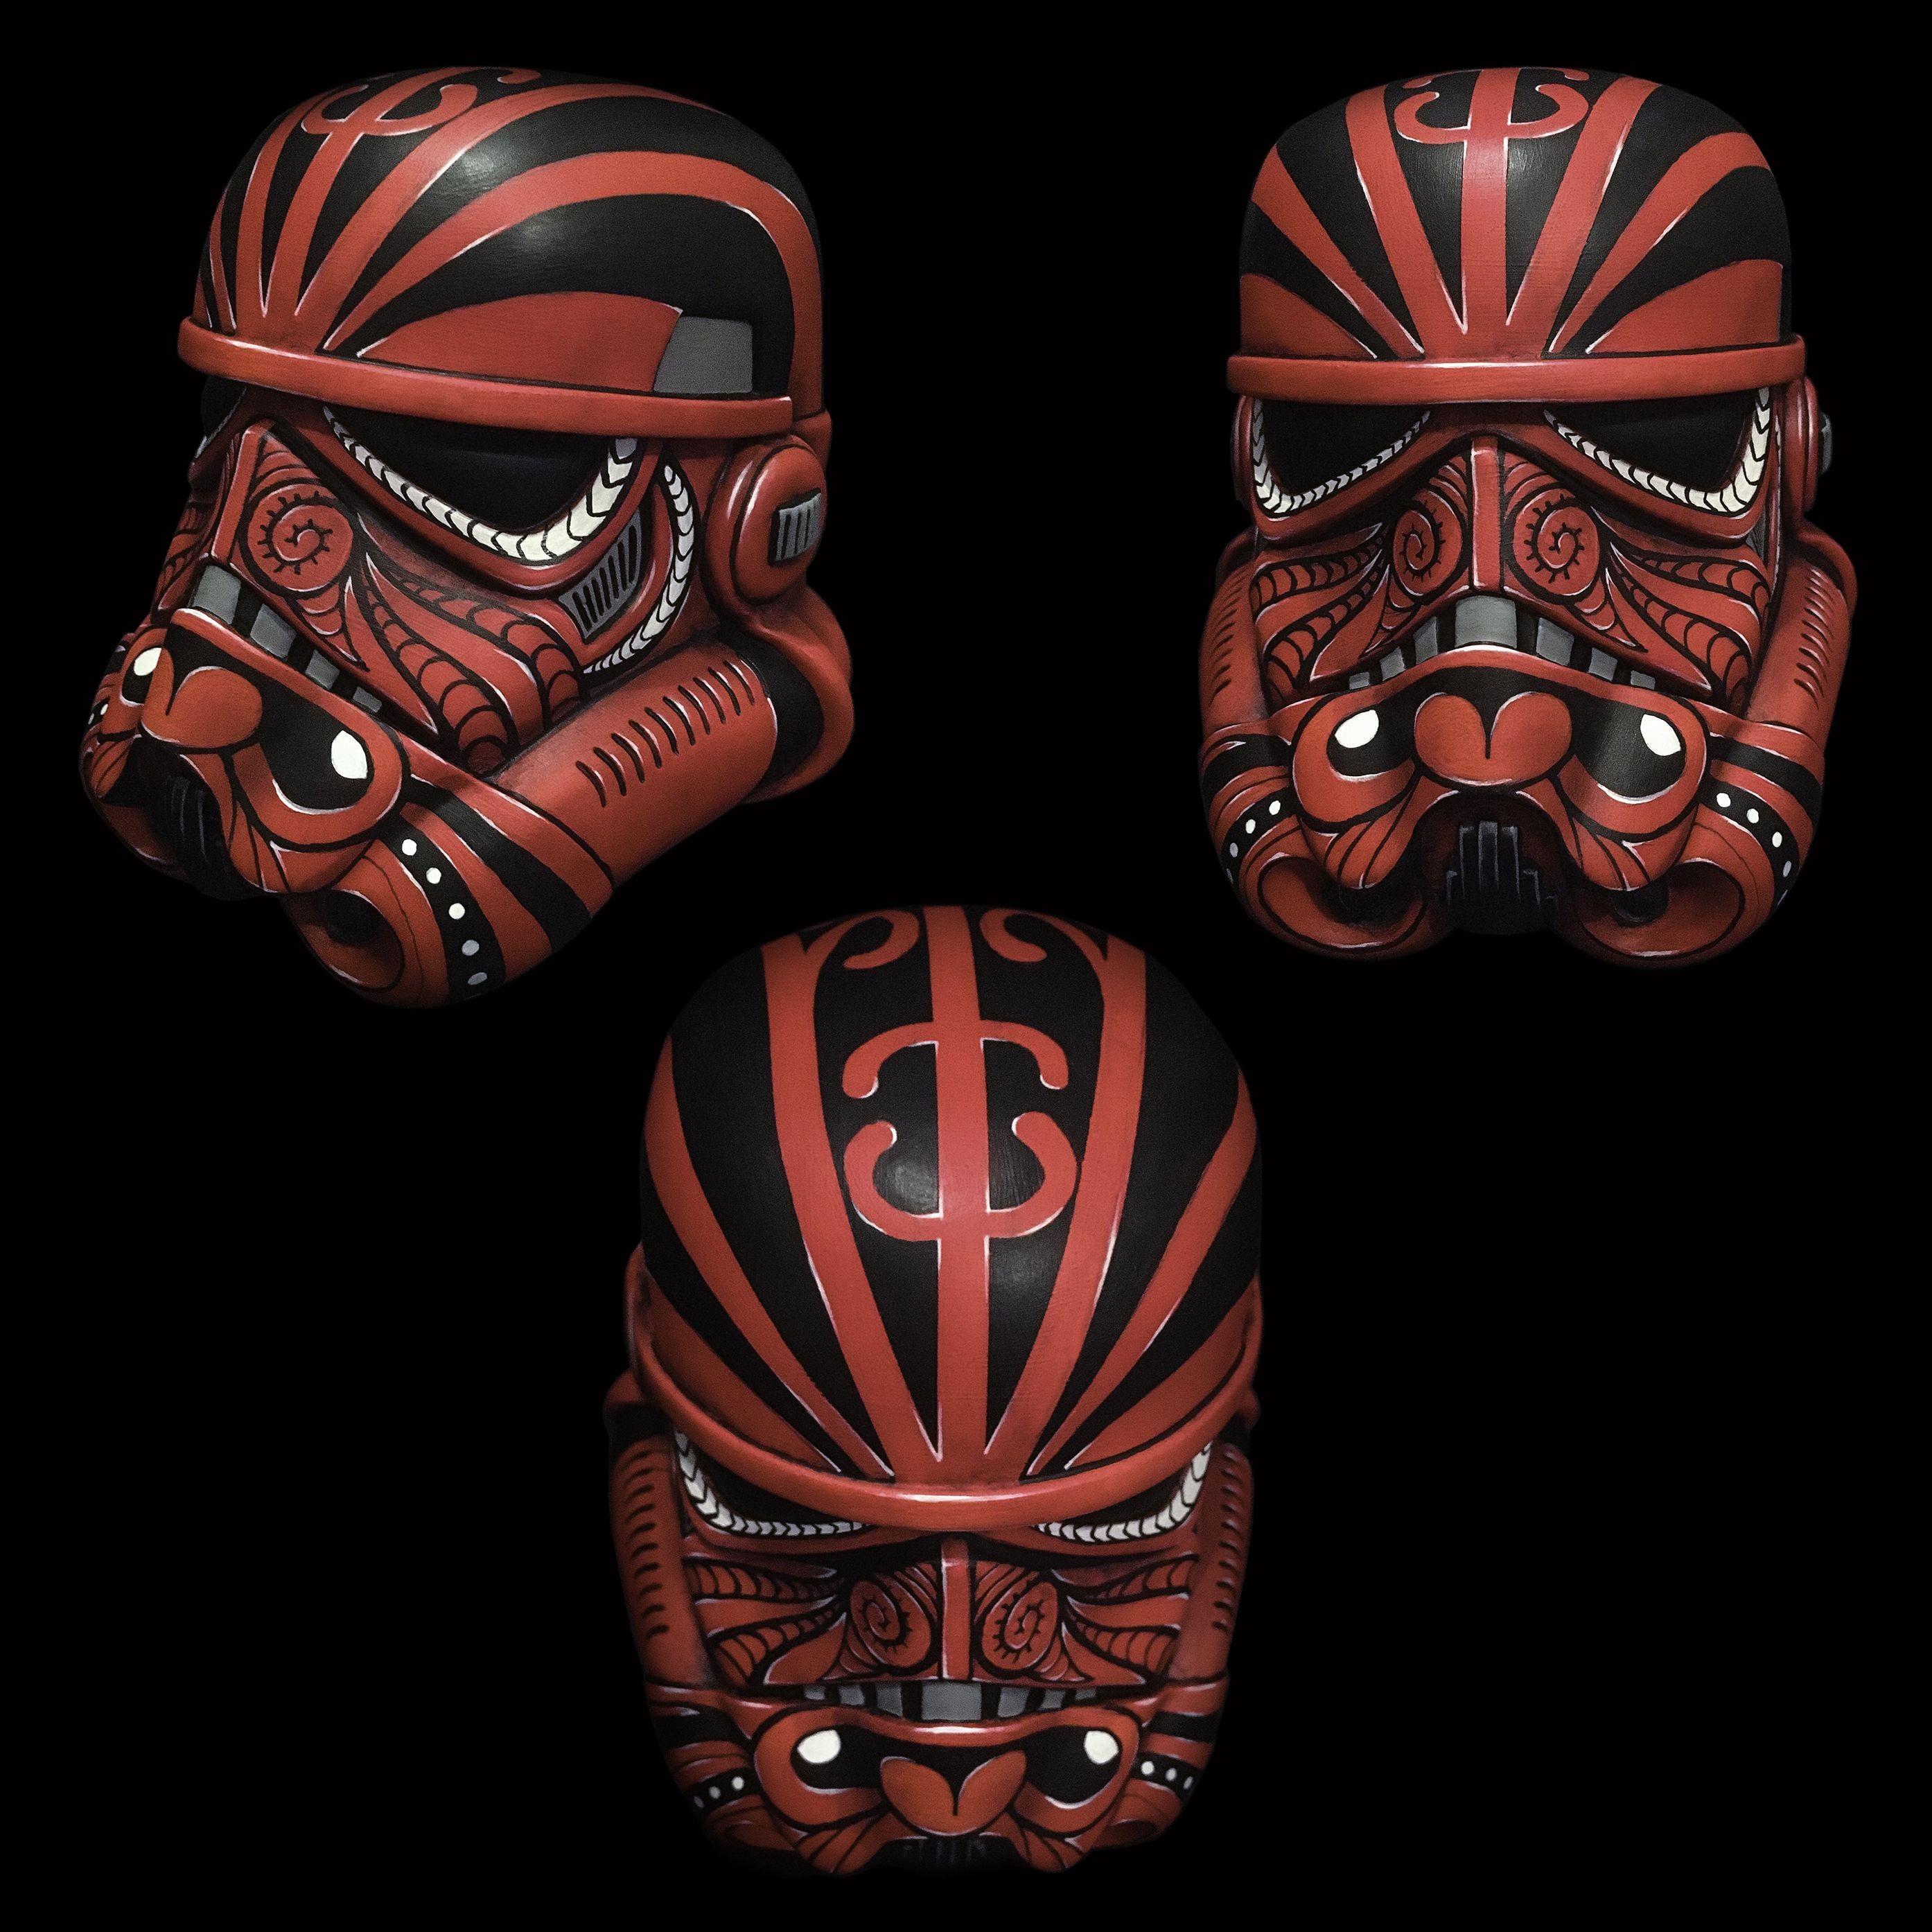 Stormtrooper Papercraft Helmet Star Wars Stormtrooper Helmet Moko Maori Tattoo Mokotrooper